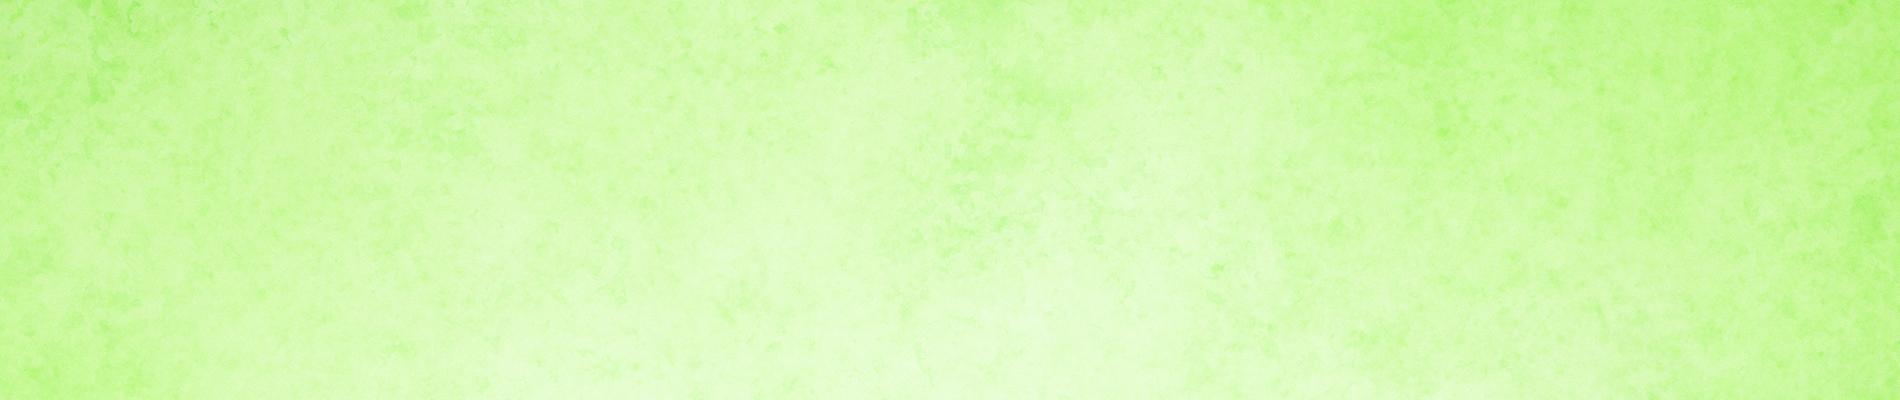 slide-backgtound-eco2